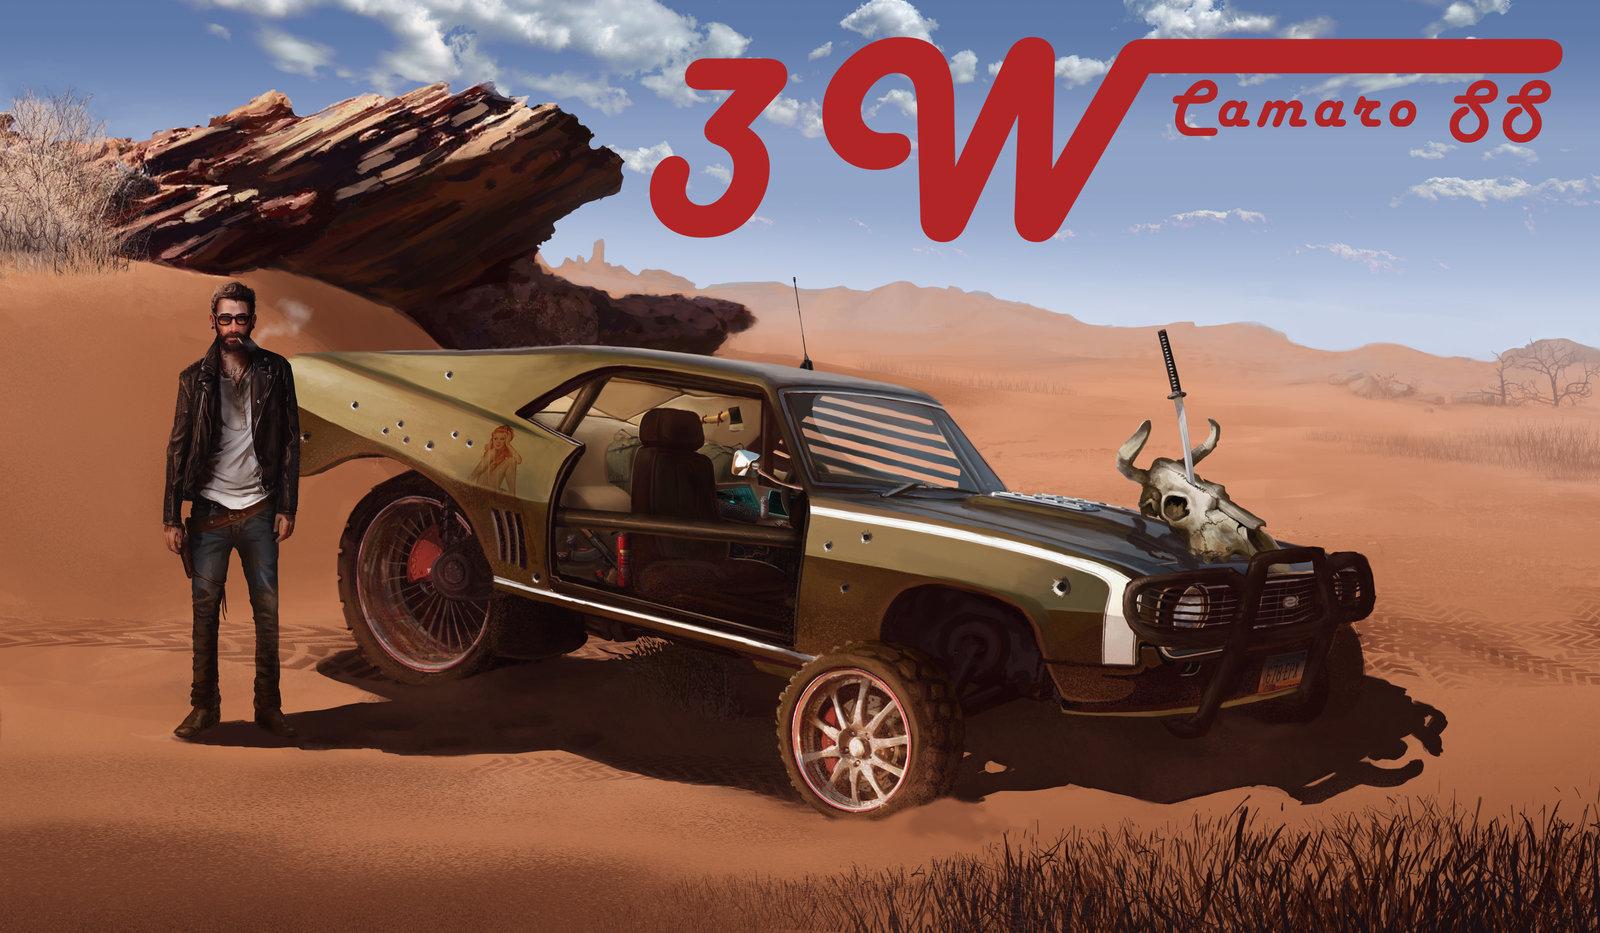 Camaro SS 3W